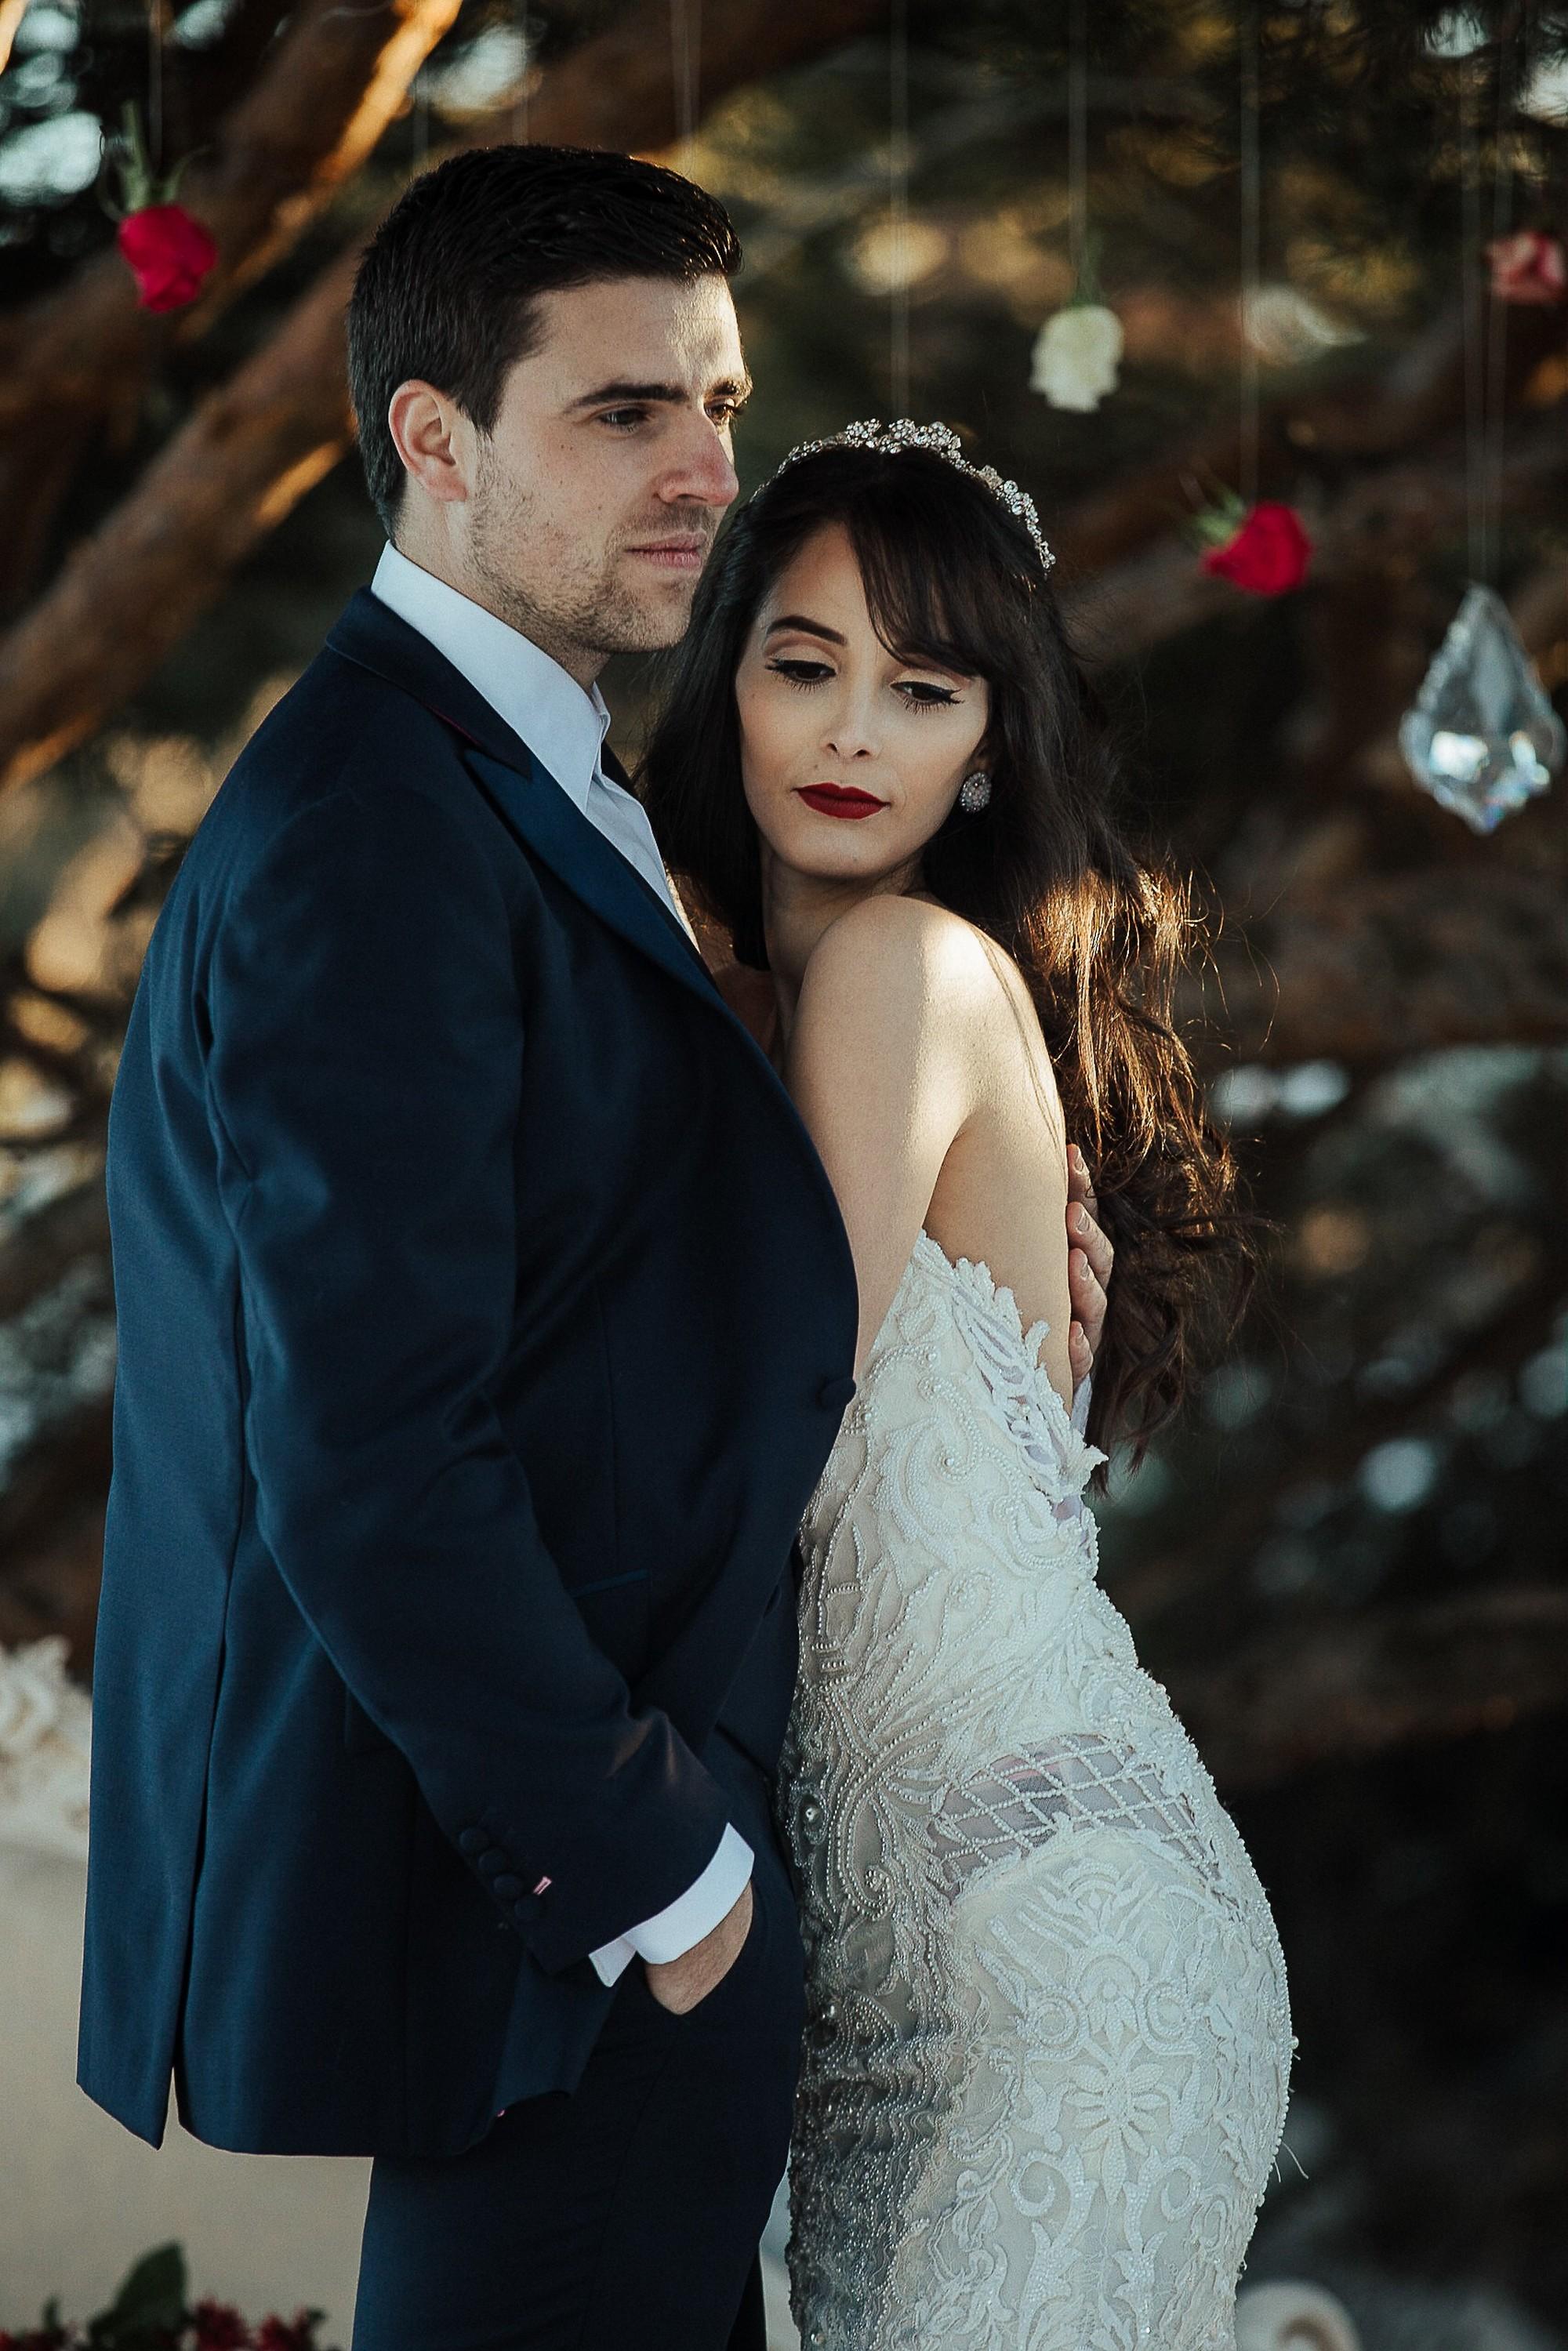 shooting inspiration dark romance mariage romantique glamour hiver neige lasoeurdelamariee blog. Black Bedroom Furniture Sets. Home Design Ideas